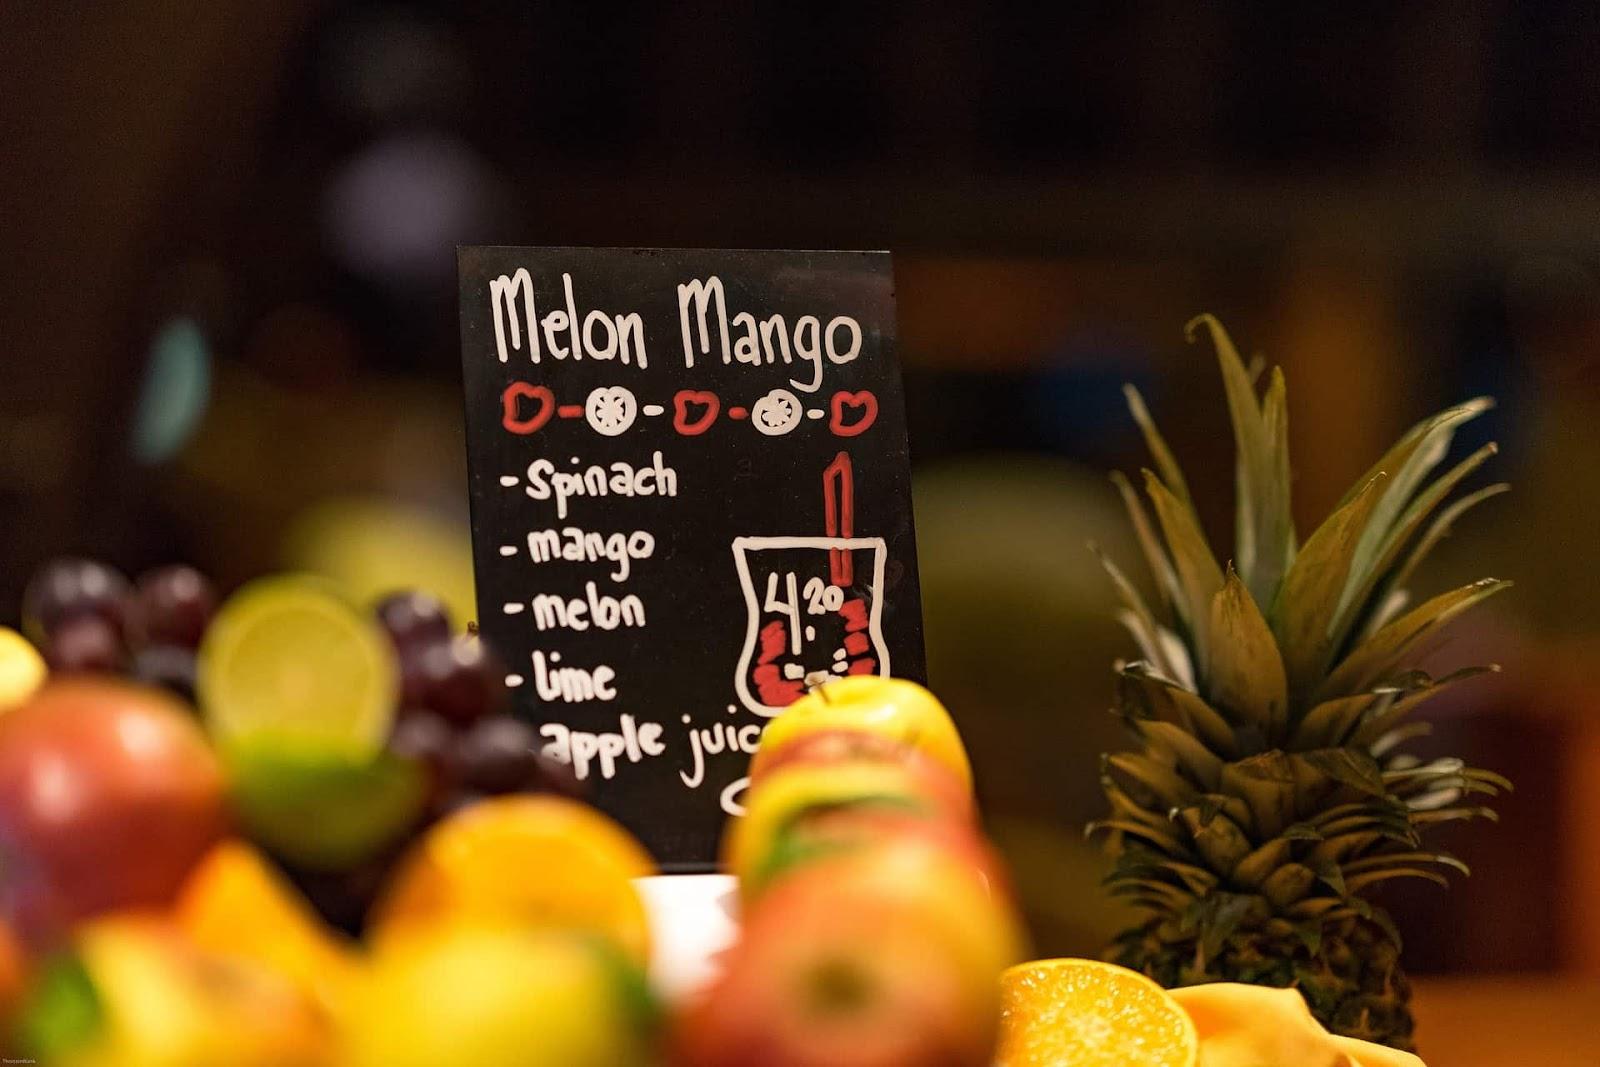 Top 8 Healthy Restaurants In Gainesville Could Not Be Overlooked